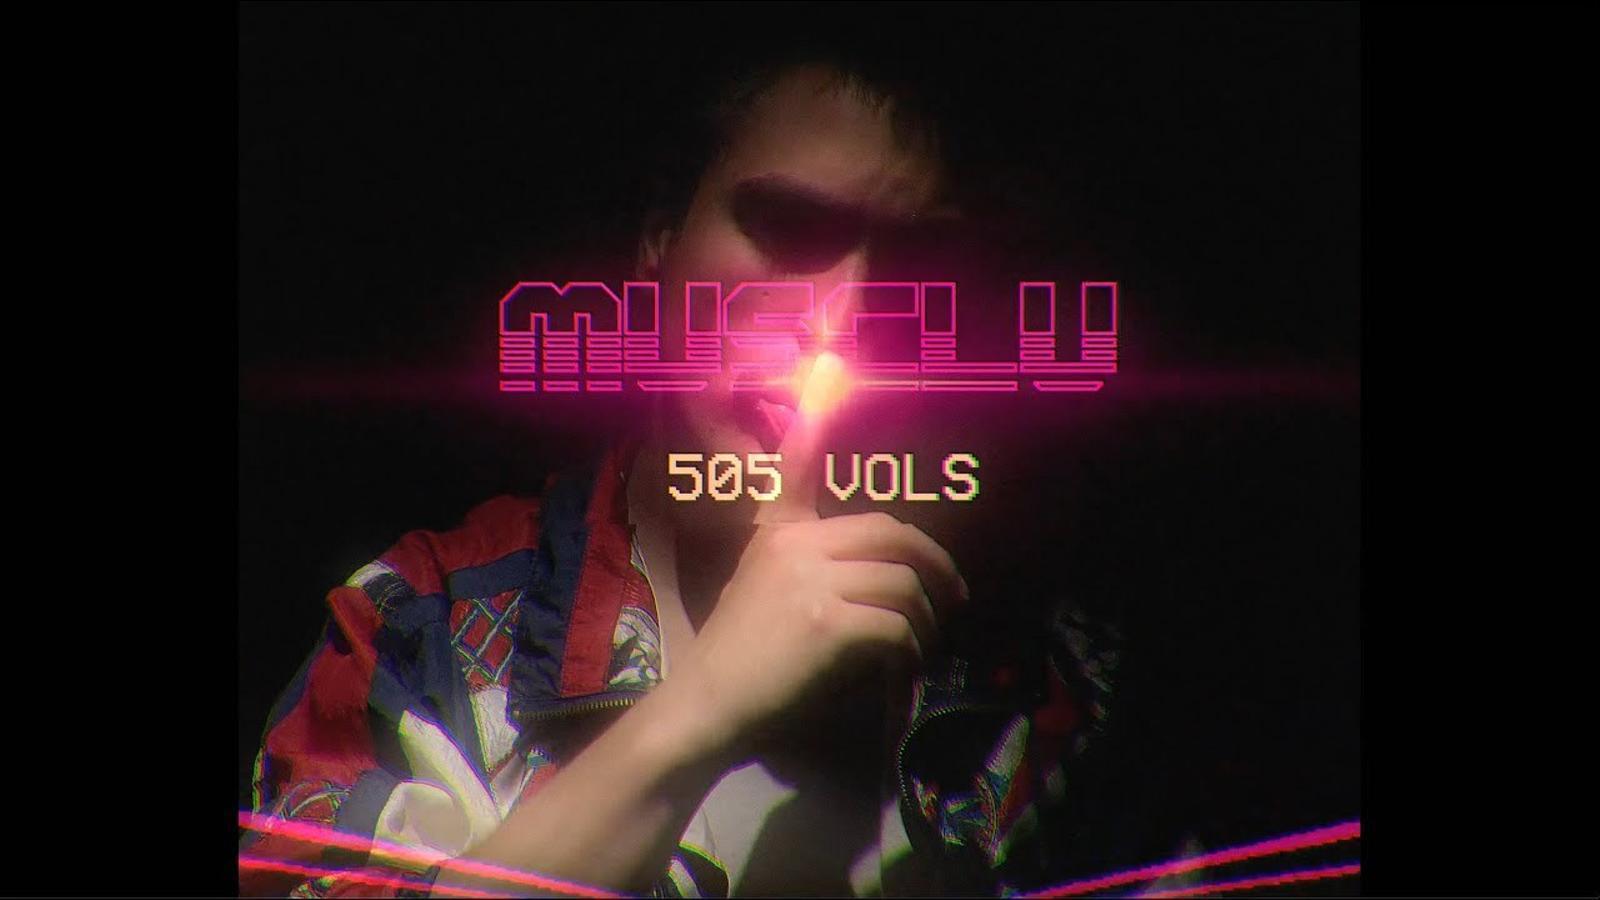 Musclu, '505 Vols', videoclip